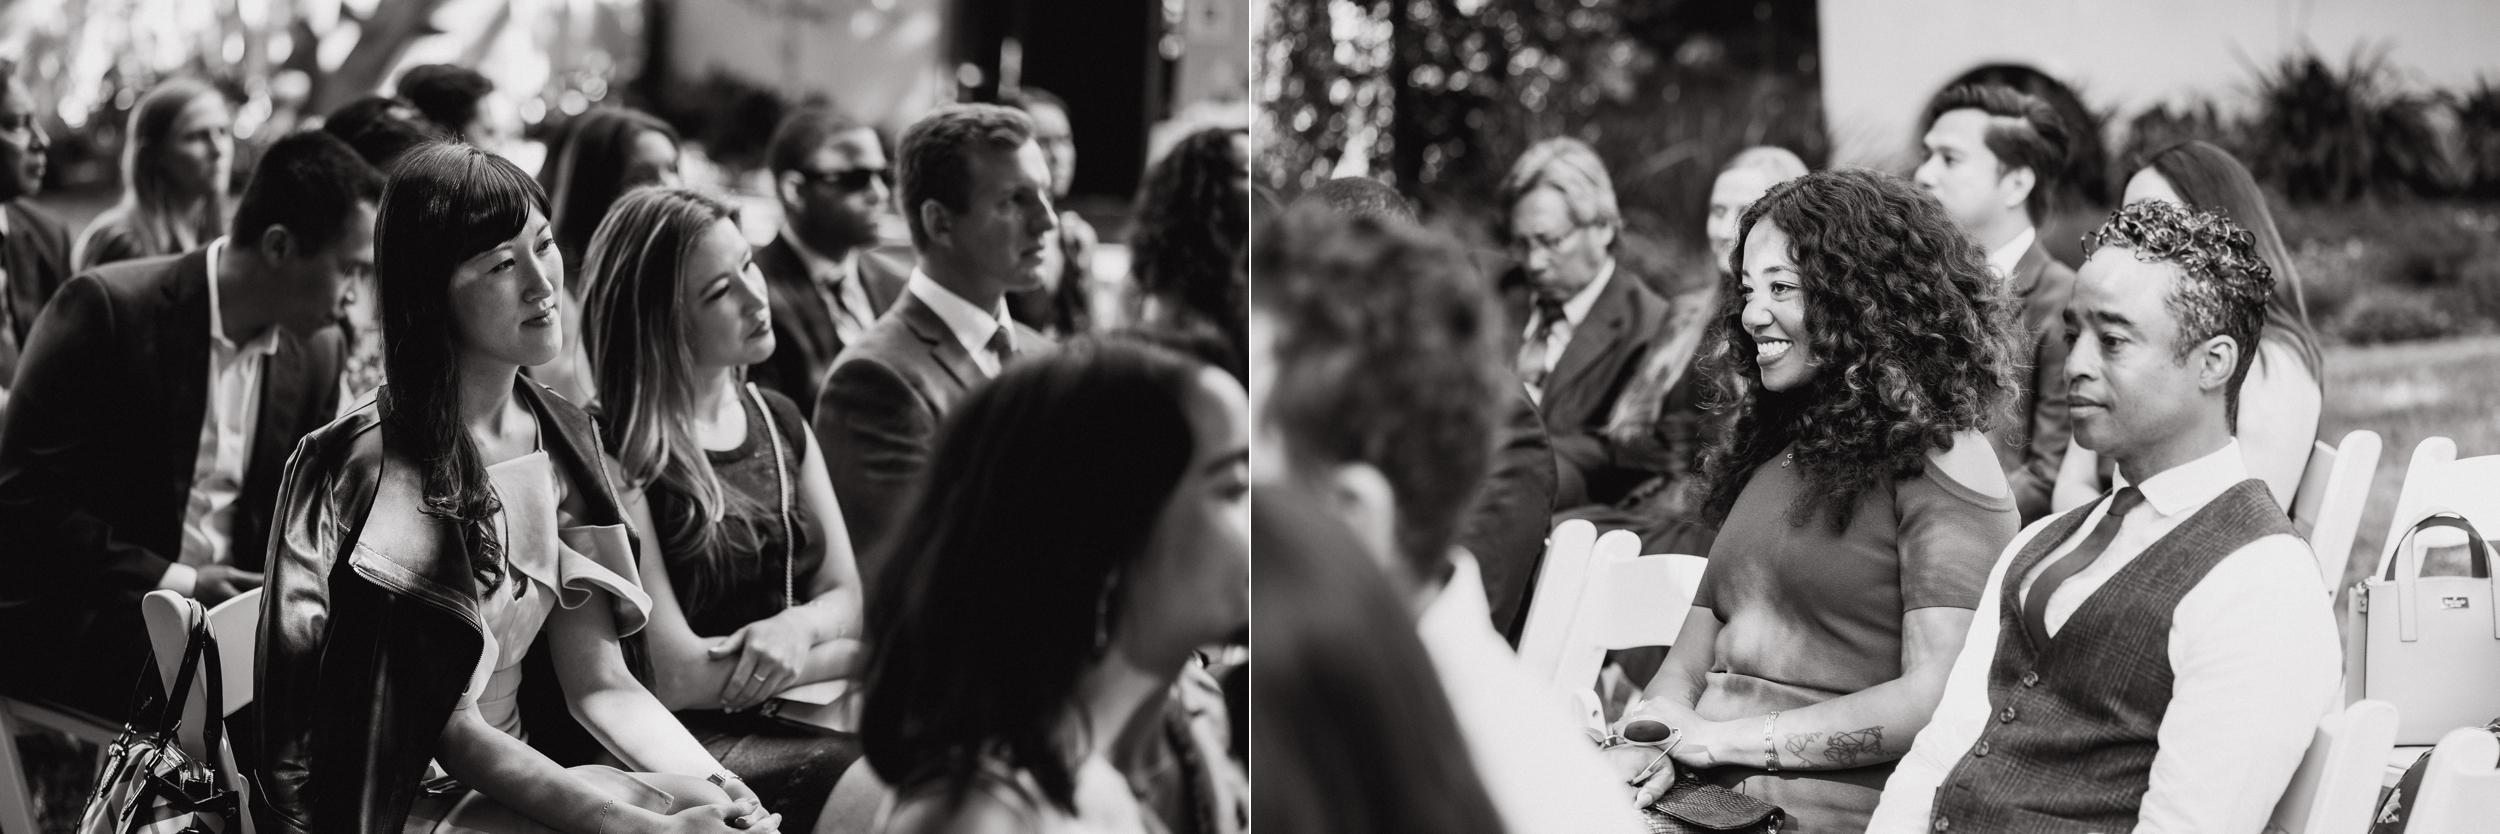 31-berkeley-uc-faculty-club-wedding-kb-vivianchen-228_WEB.jpg